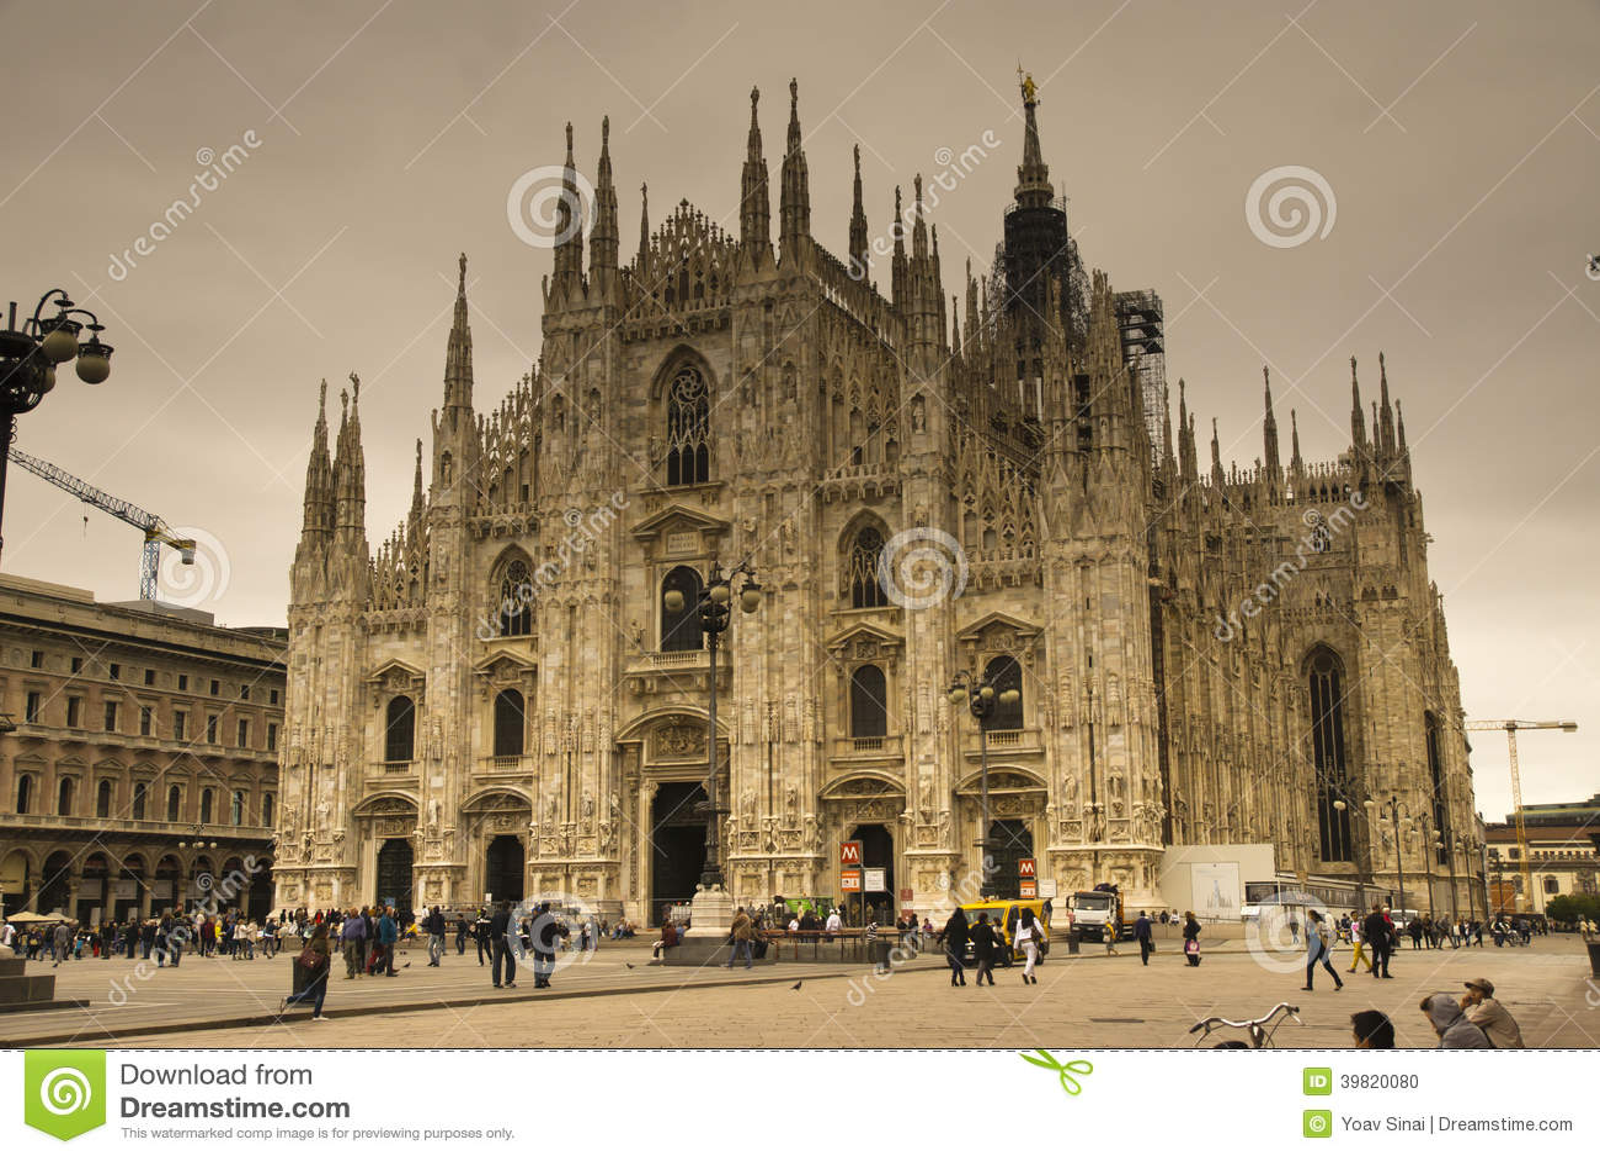 El Duomo Cathdral Milano Italia